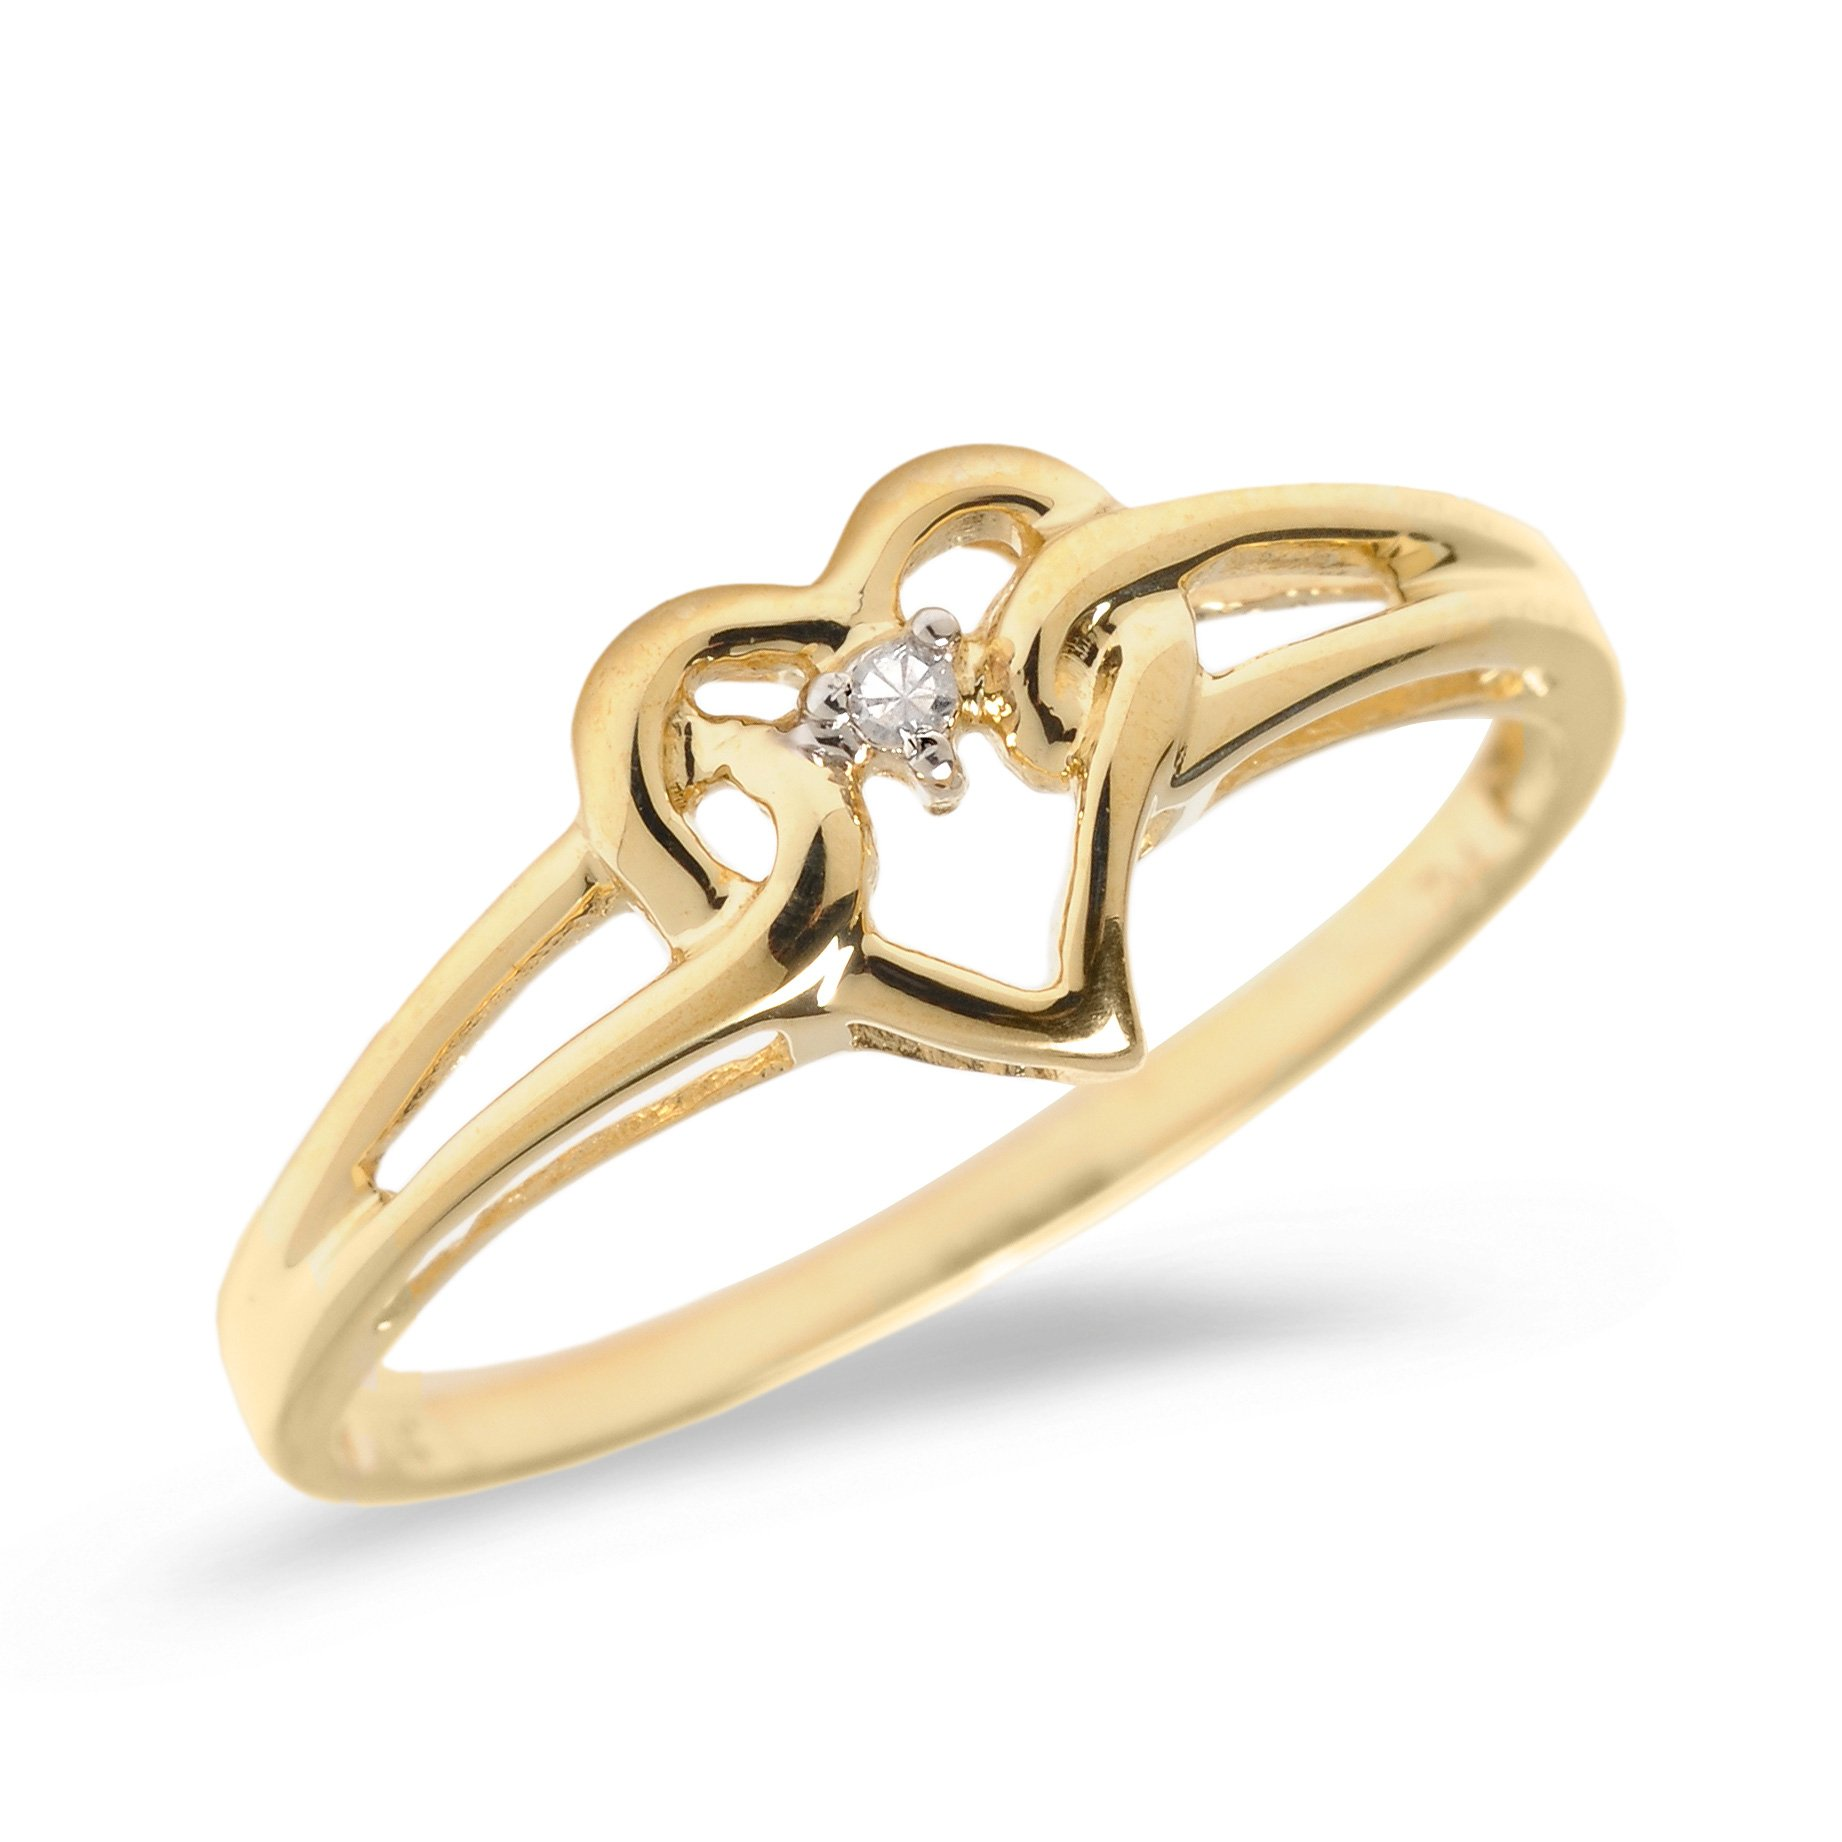 10K Yellow Gold Diamond Heart Ring (Size 7)